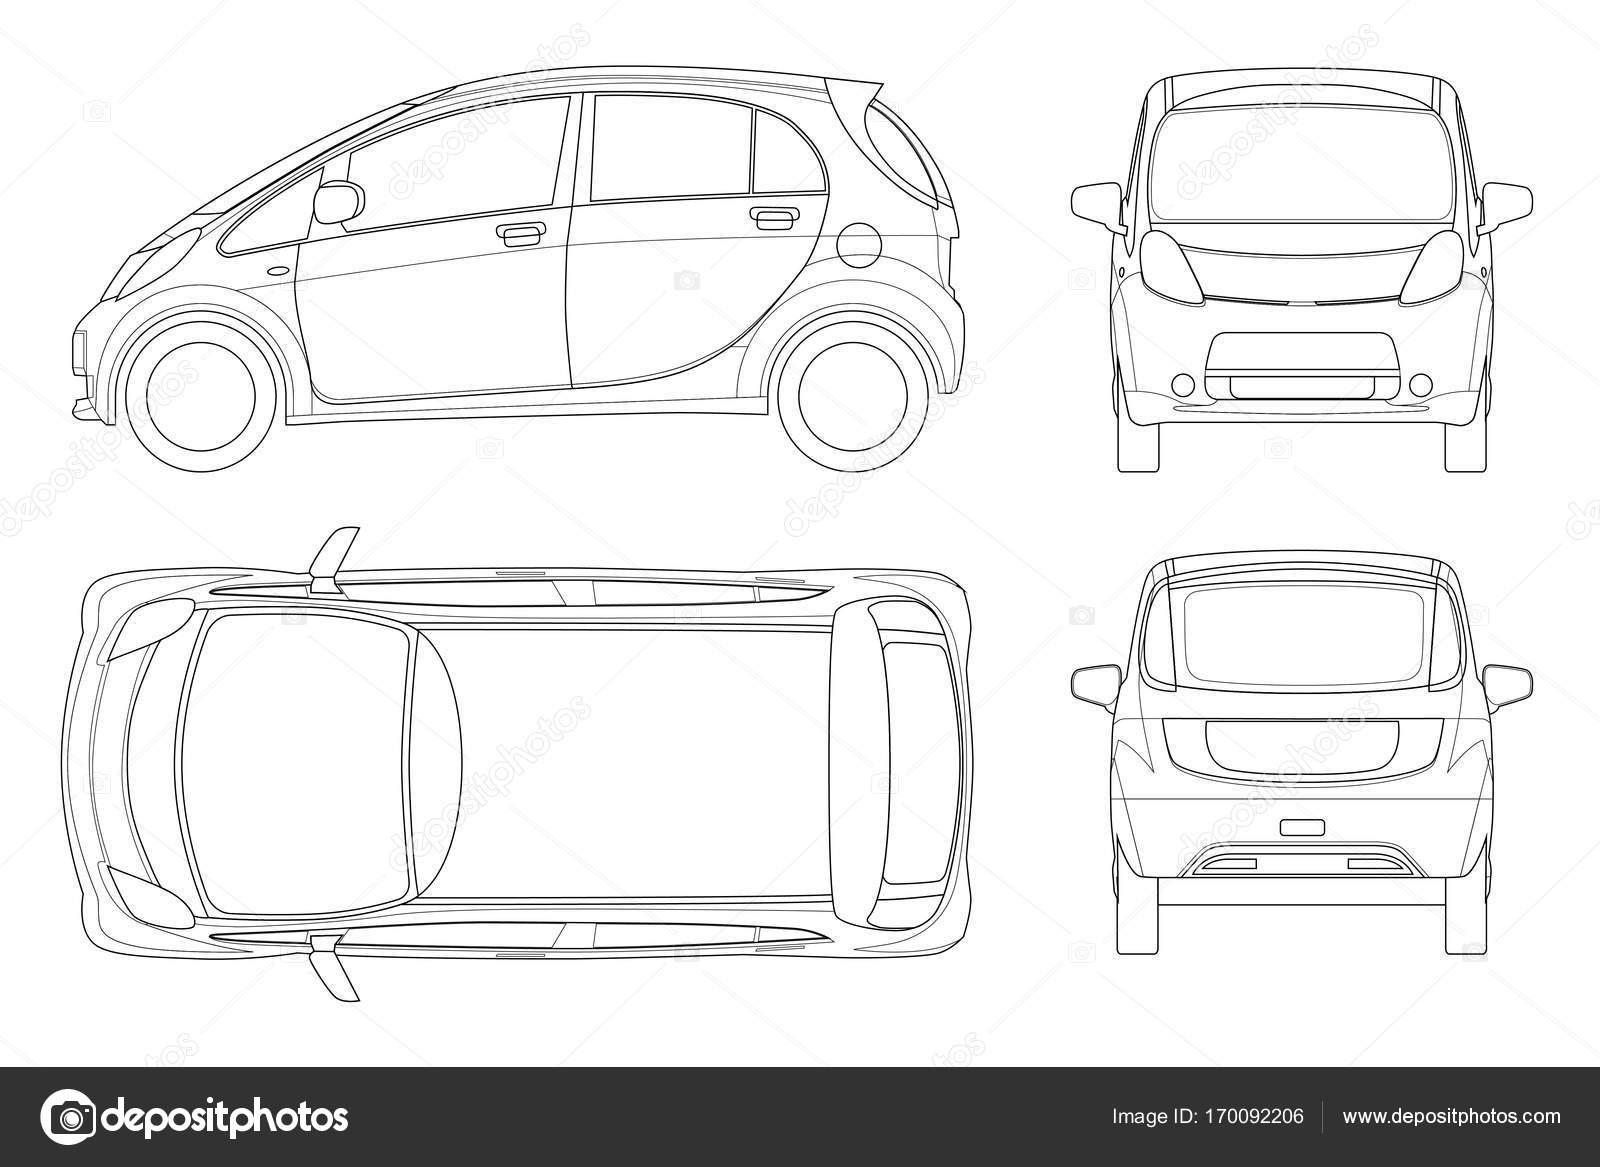 Fahrzeug oder Hybrid-Elektroauto im Umriss. Öko-Hightech-Auto ...